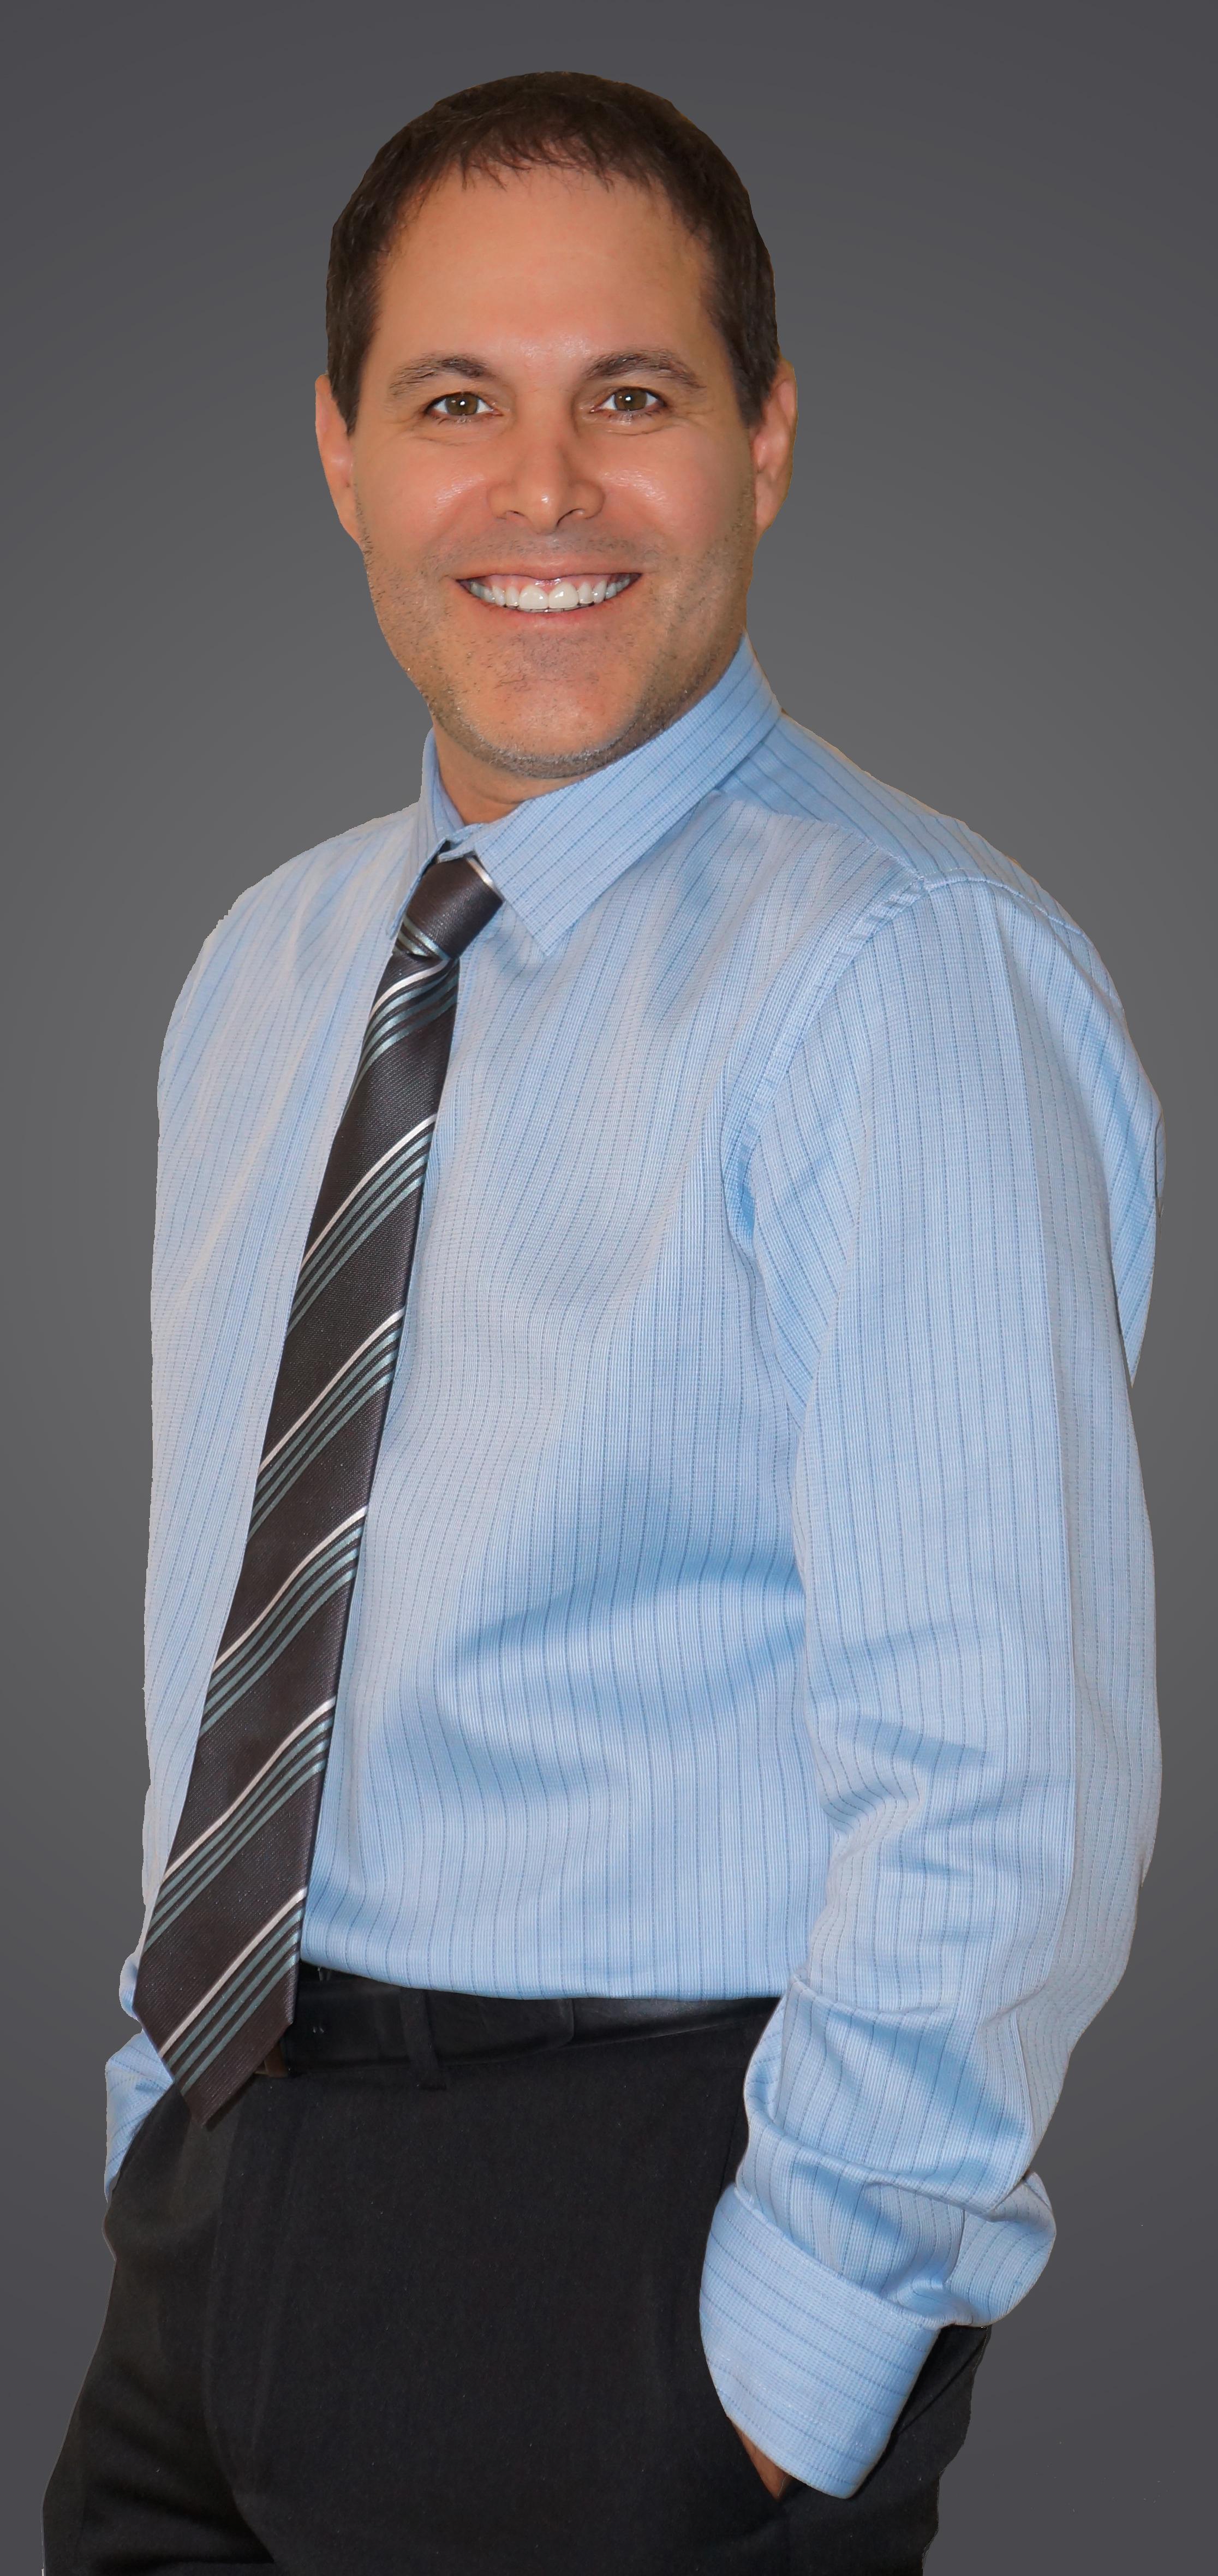 Craig Martin - craig grey2.jpg